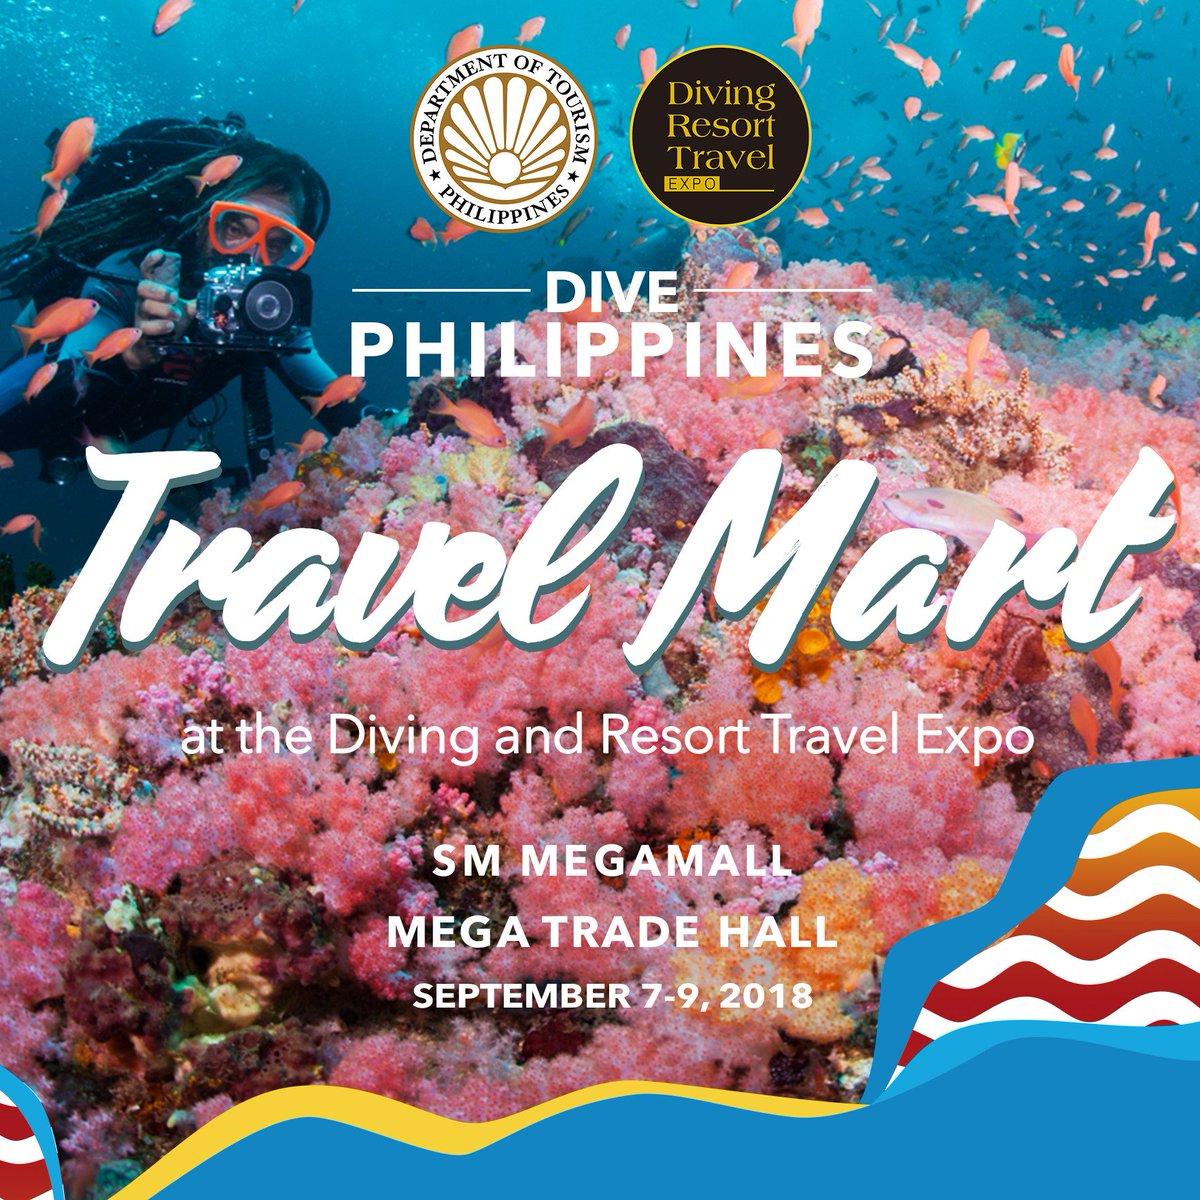 Visit Philippines on Twitter: